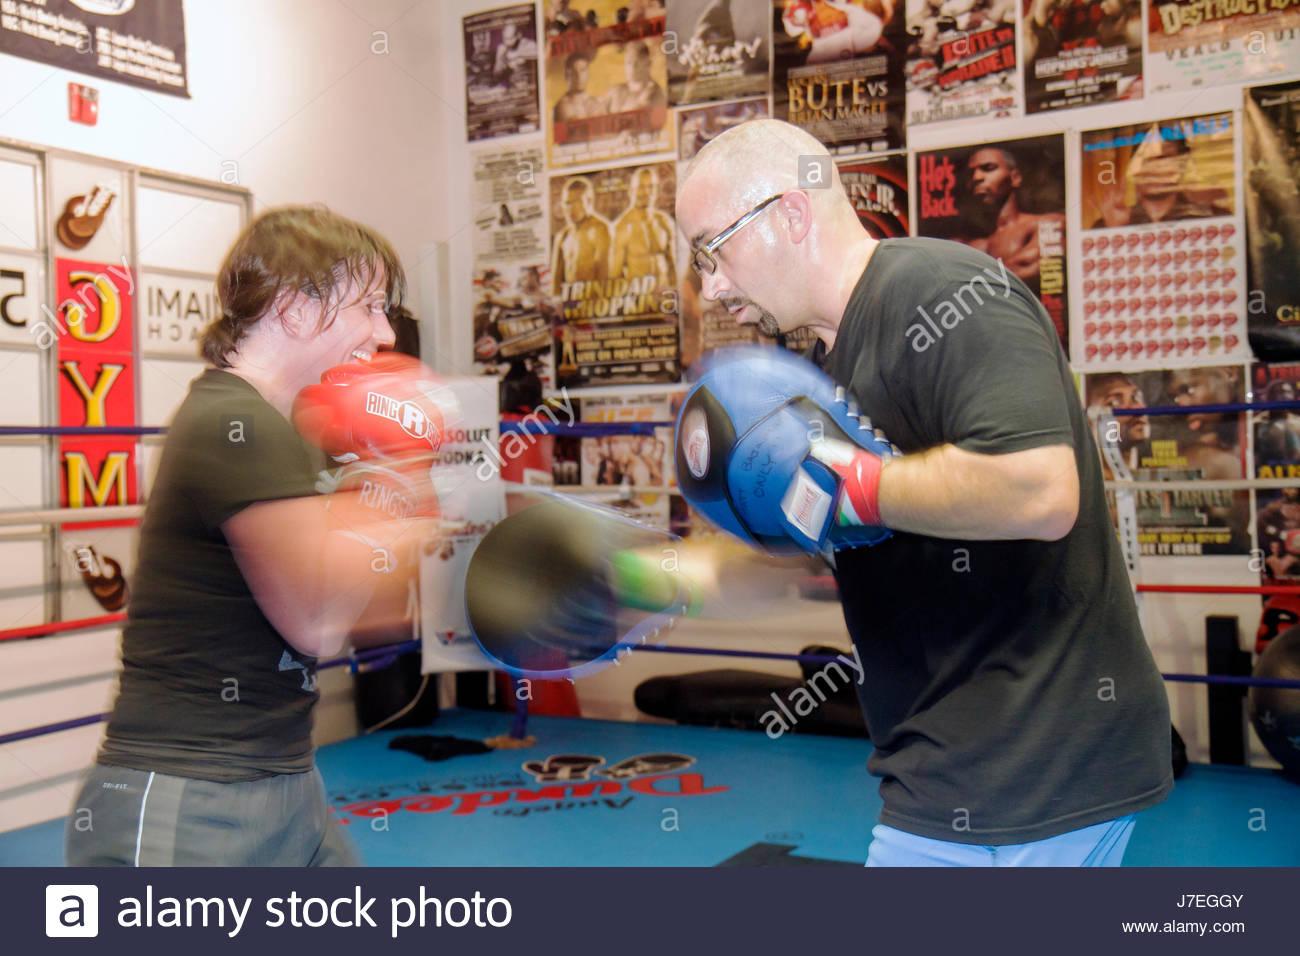 Miami Beach Florida Washington Avenue 5th Street Gym boxing training woman man trainer ring punching jabbing workout - Stock Image